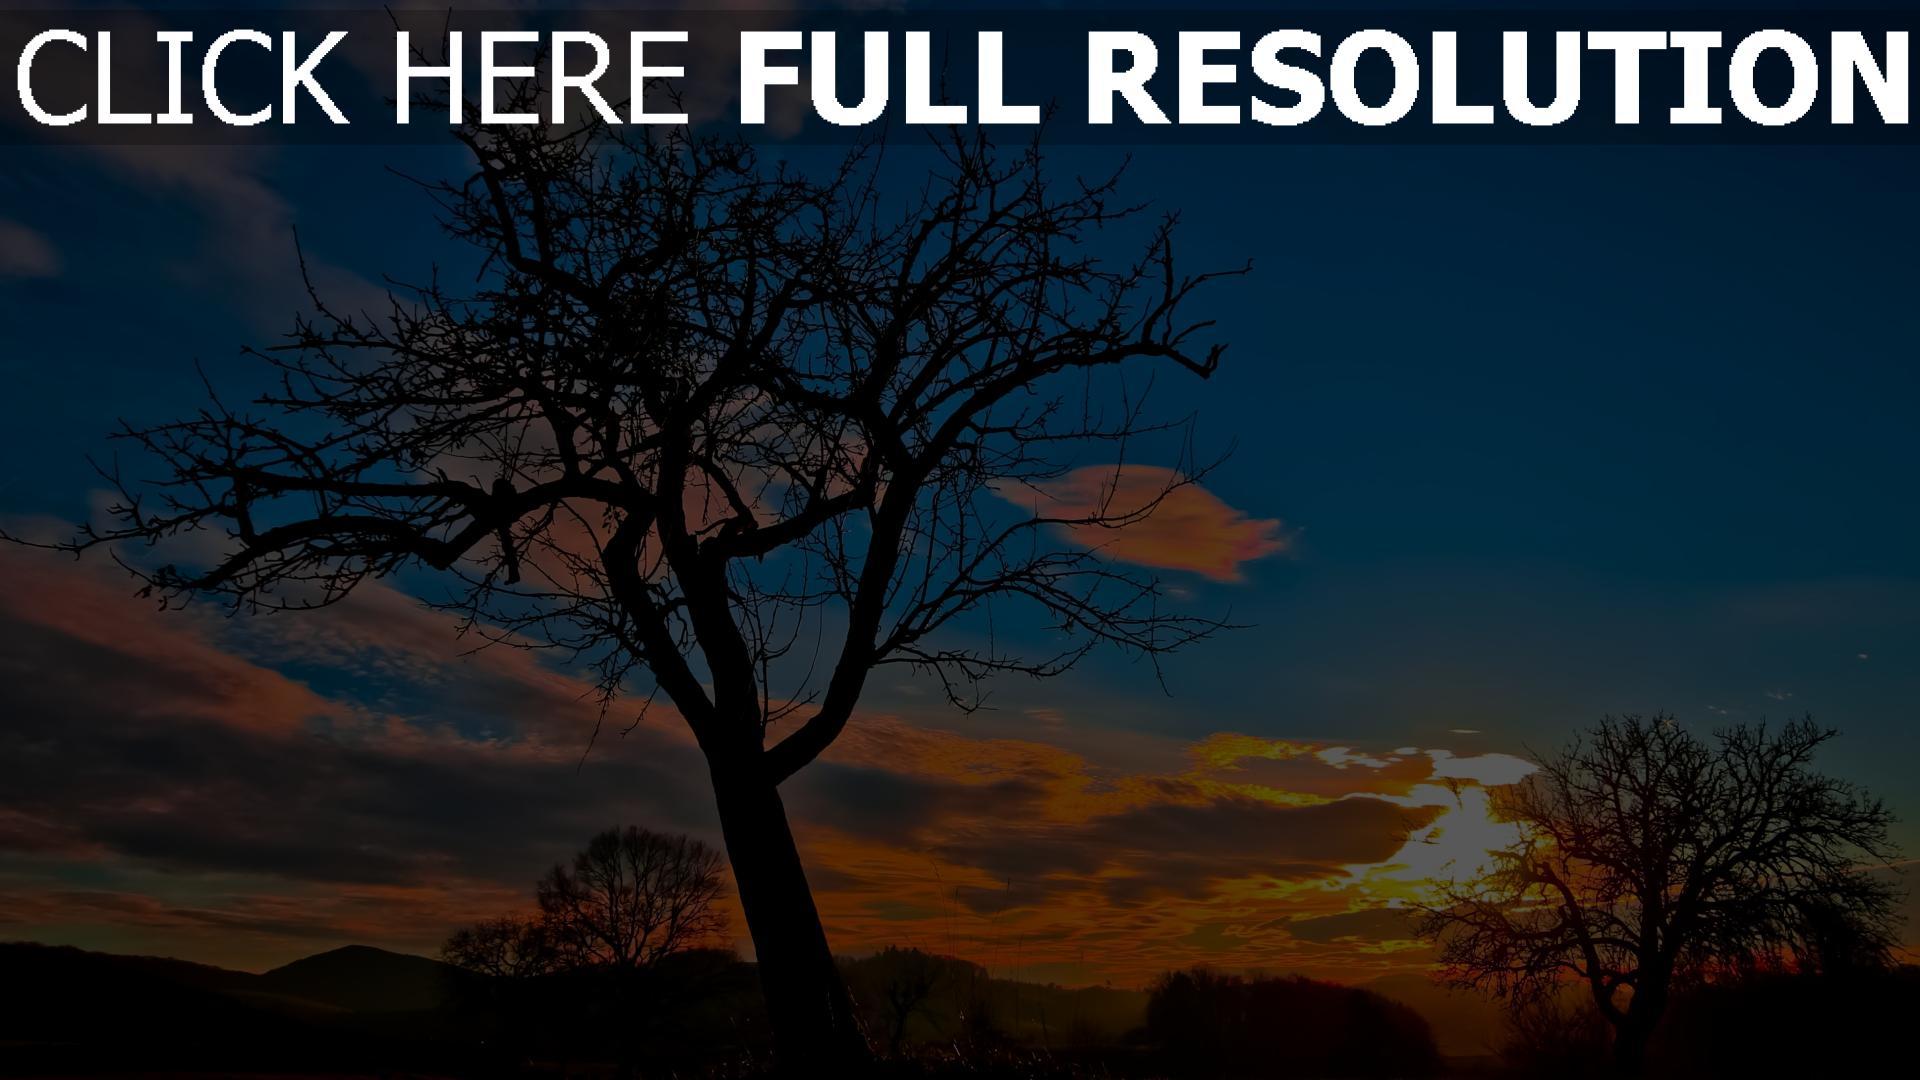 hd hintergrundbilder baum himmel sonnenuntergang silhouette wolken 1920x1080